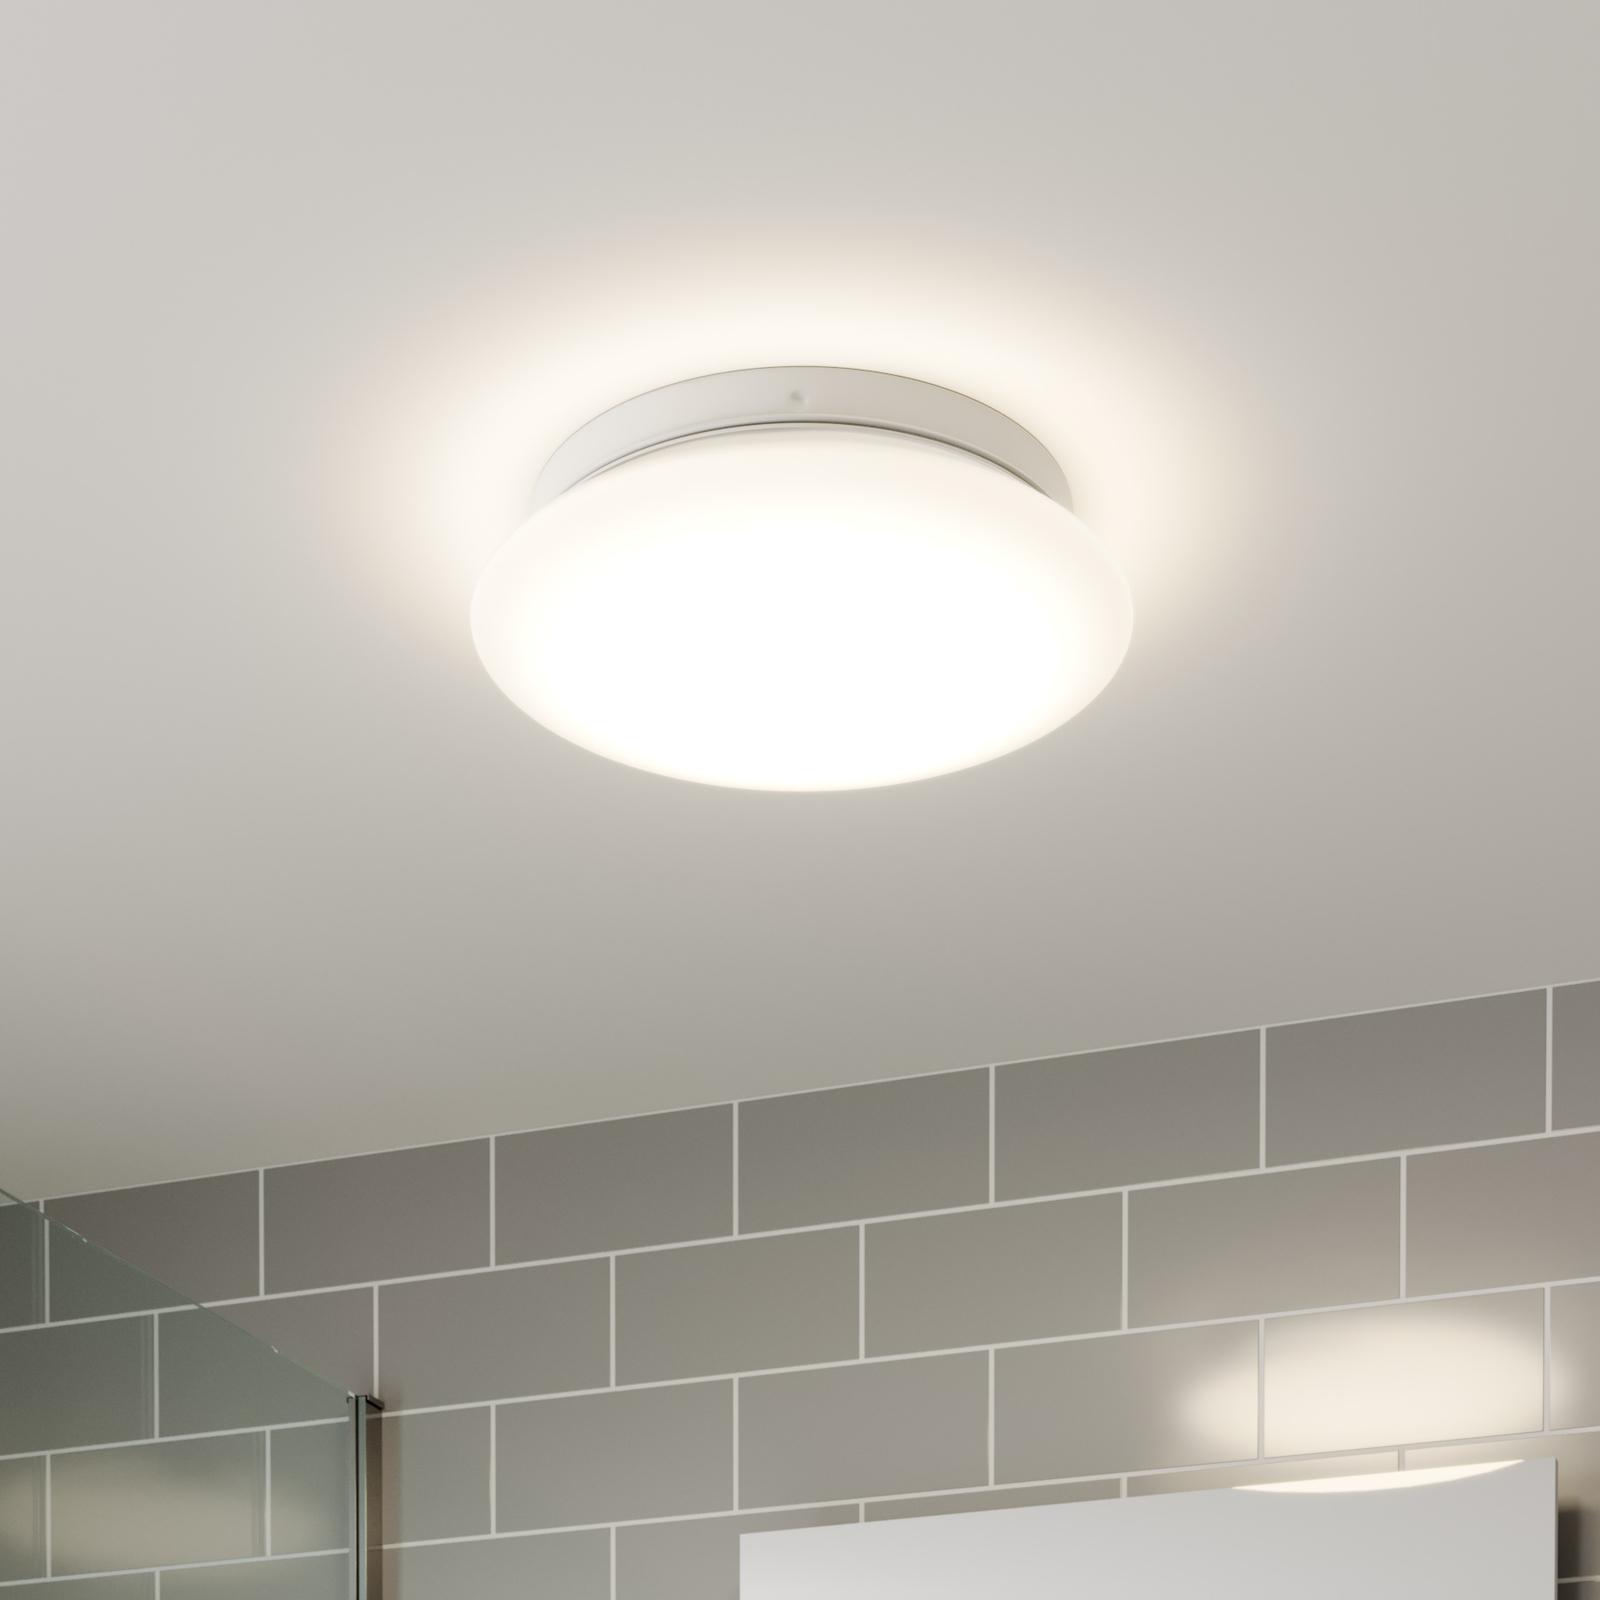 Arcchio Solomia LED-Deckenlampe, Sensor, 4.000 K